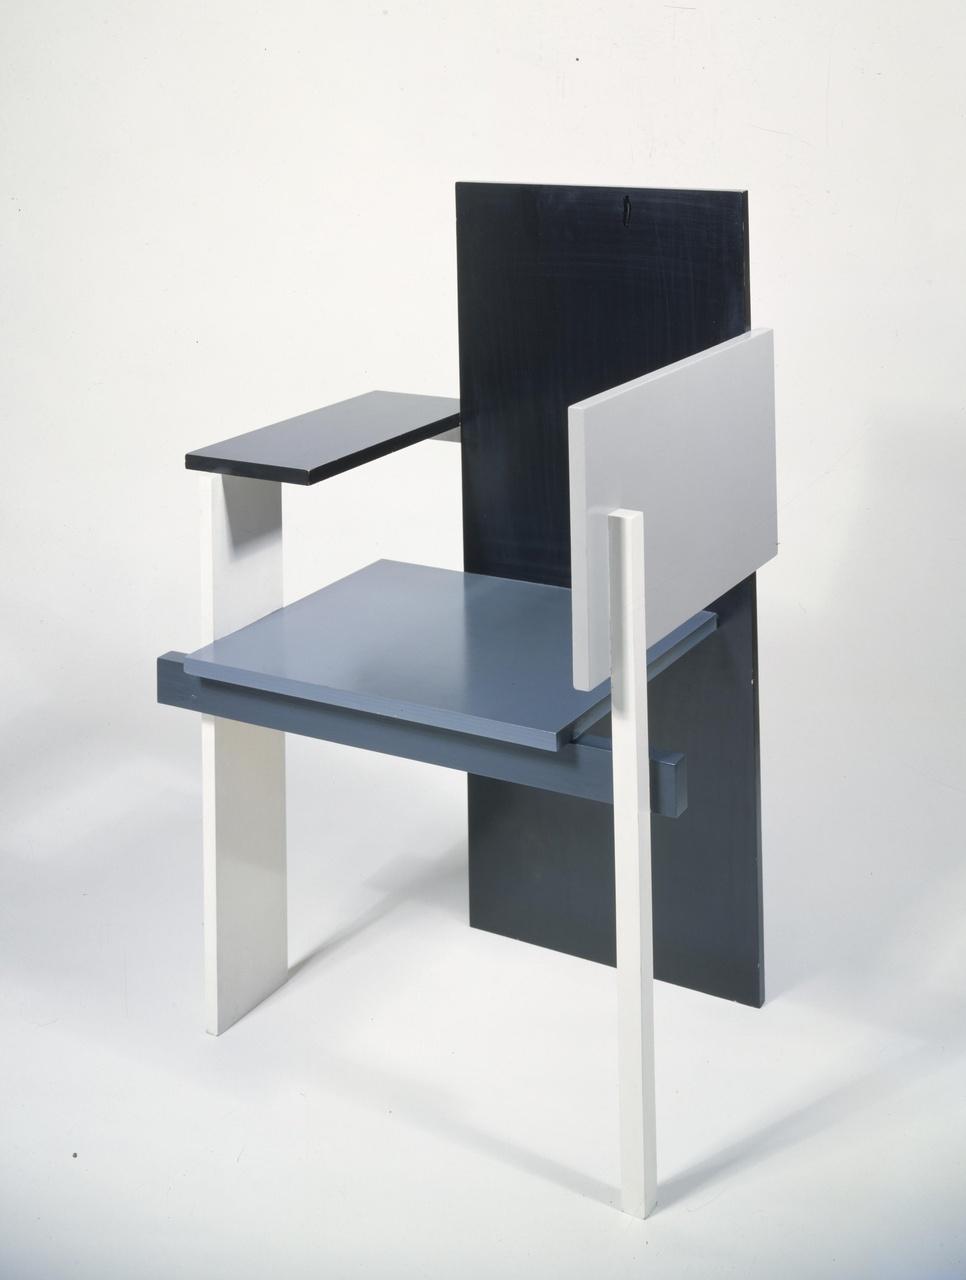 Berlijnse stoel